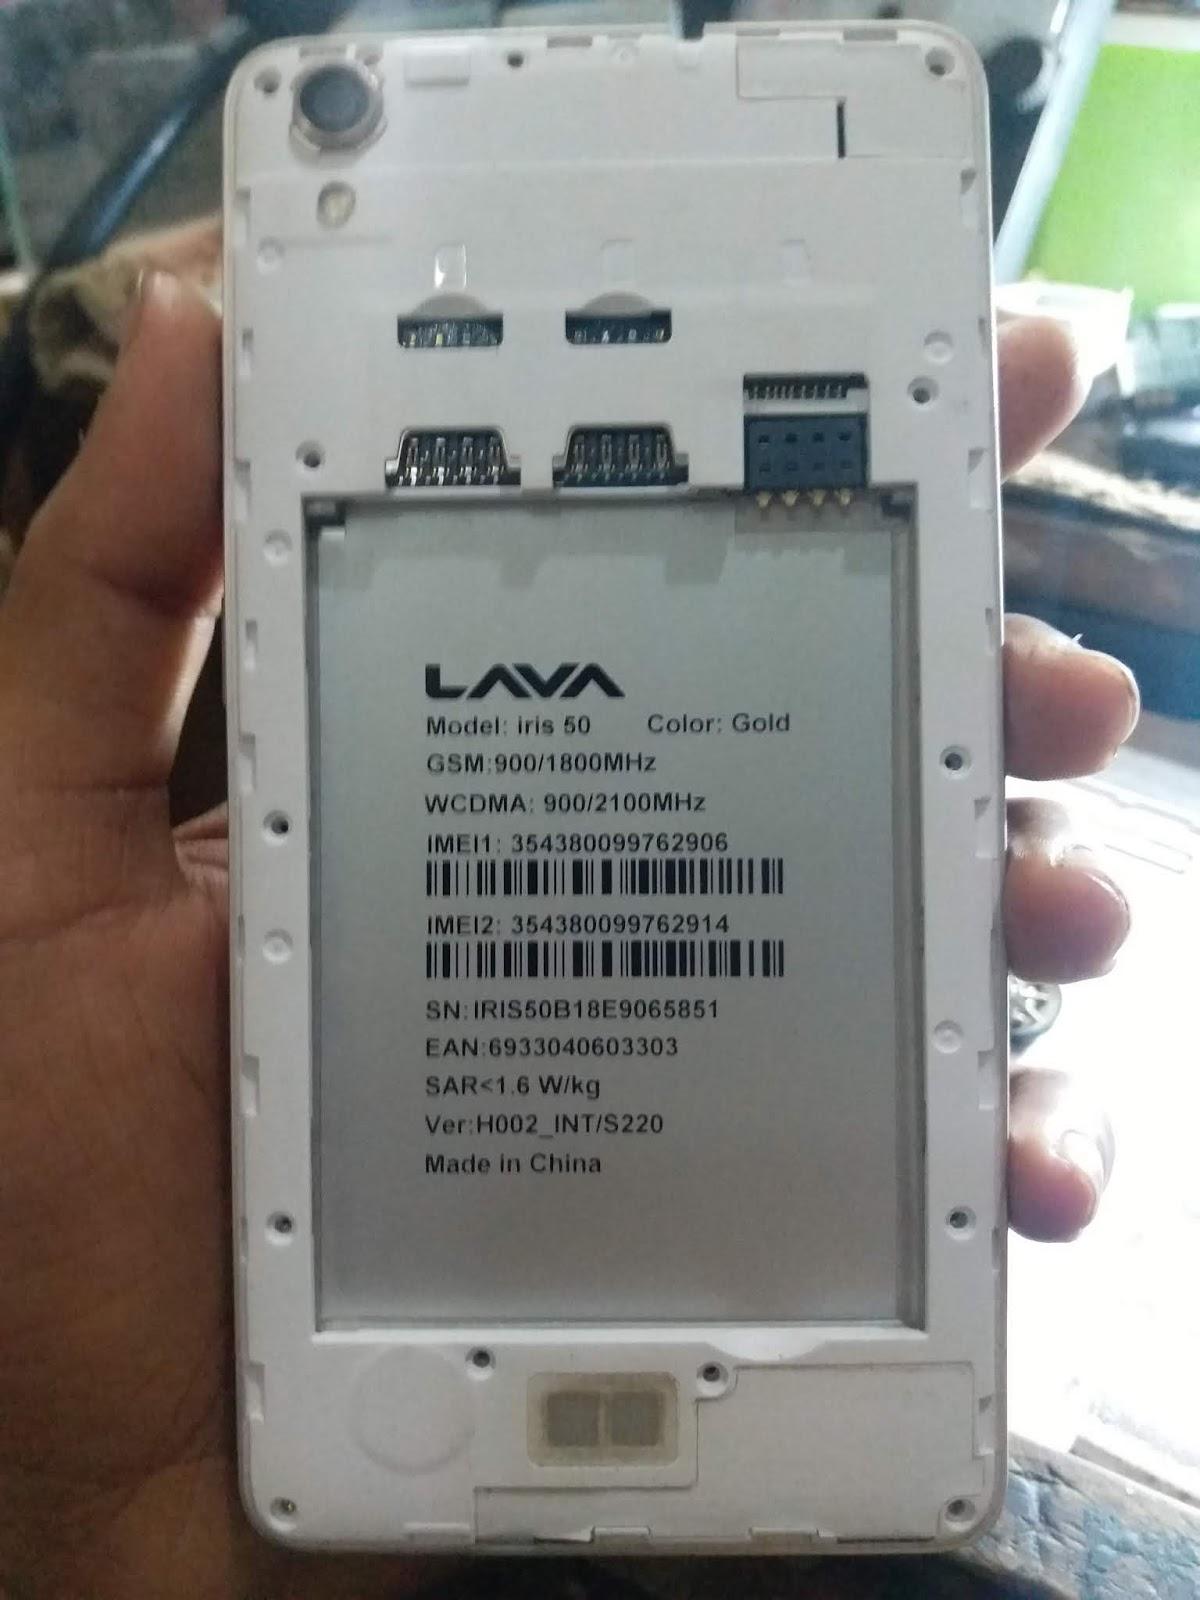 Lava Iris 50 S220 Frp Hang Logo Lcd Fix Firmware Flash File